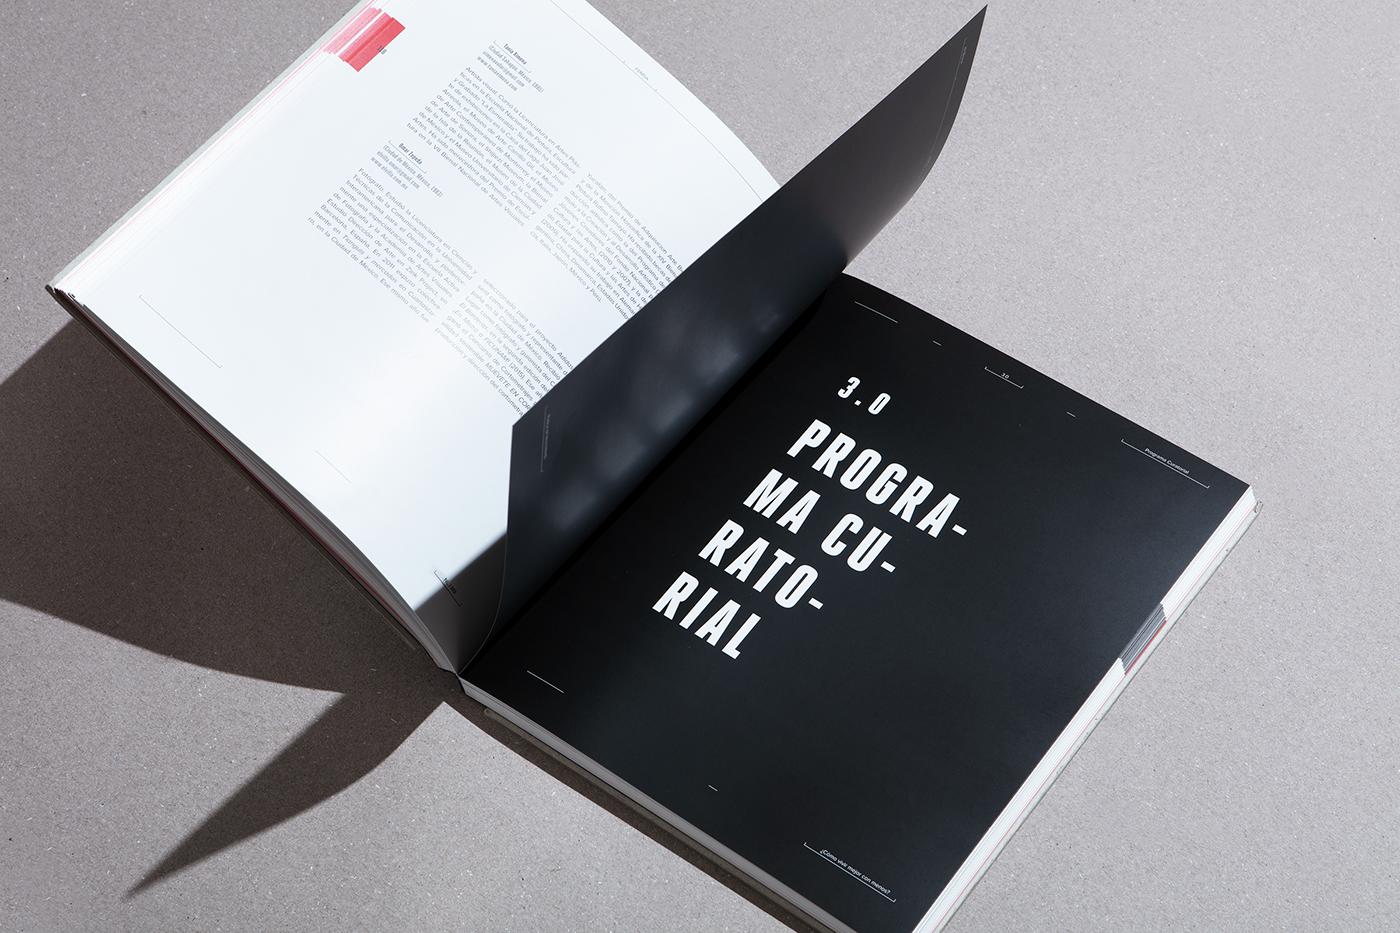 Bienal Femsa 摄影画册插图(3)